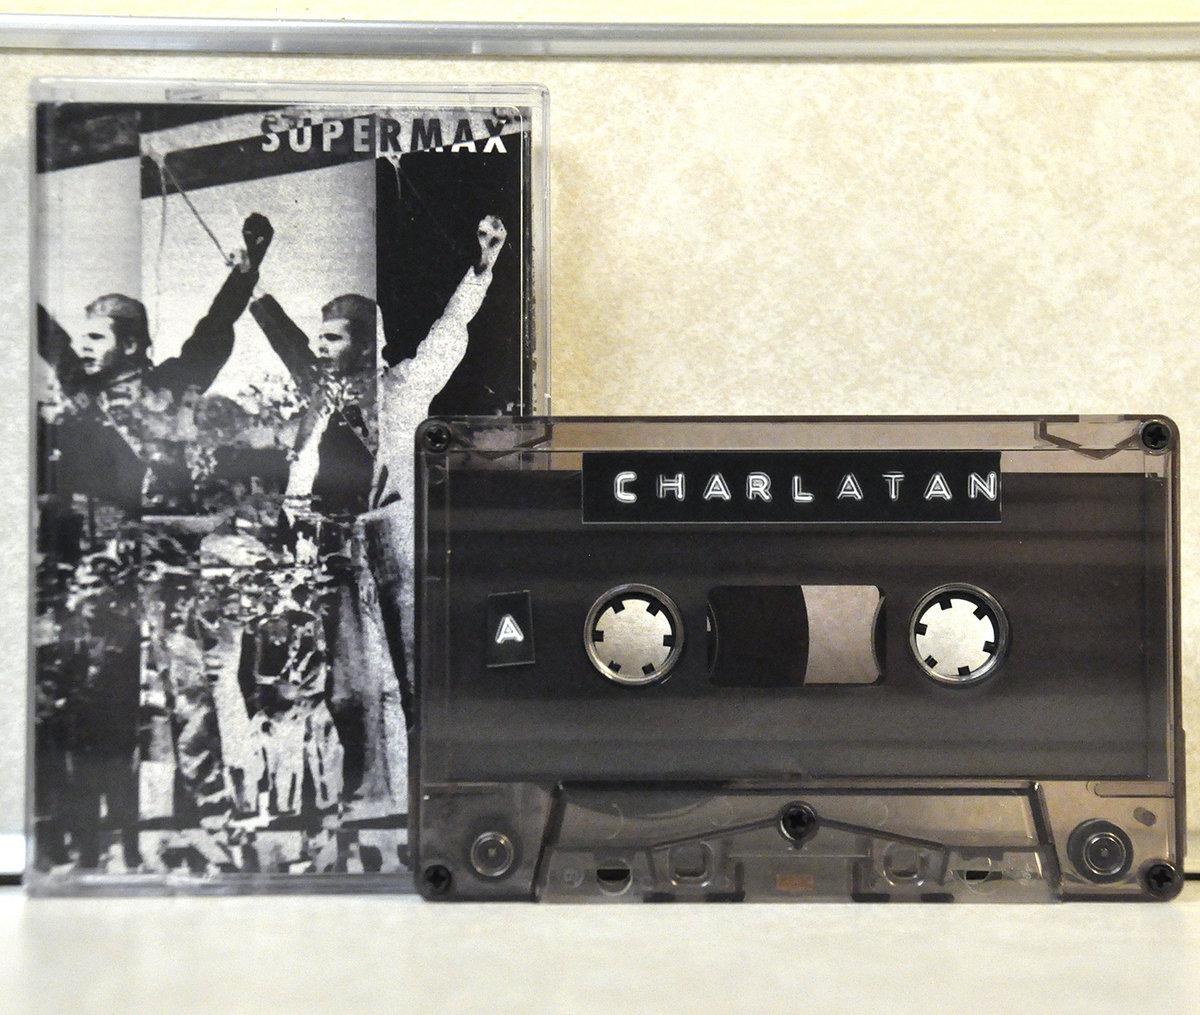 Supermax | Charlatan